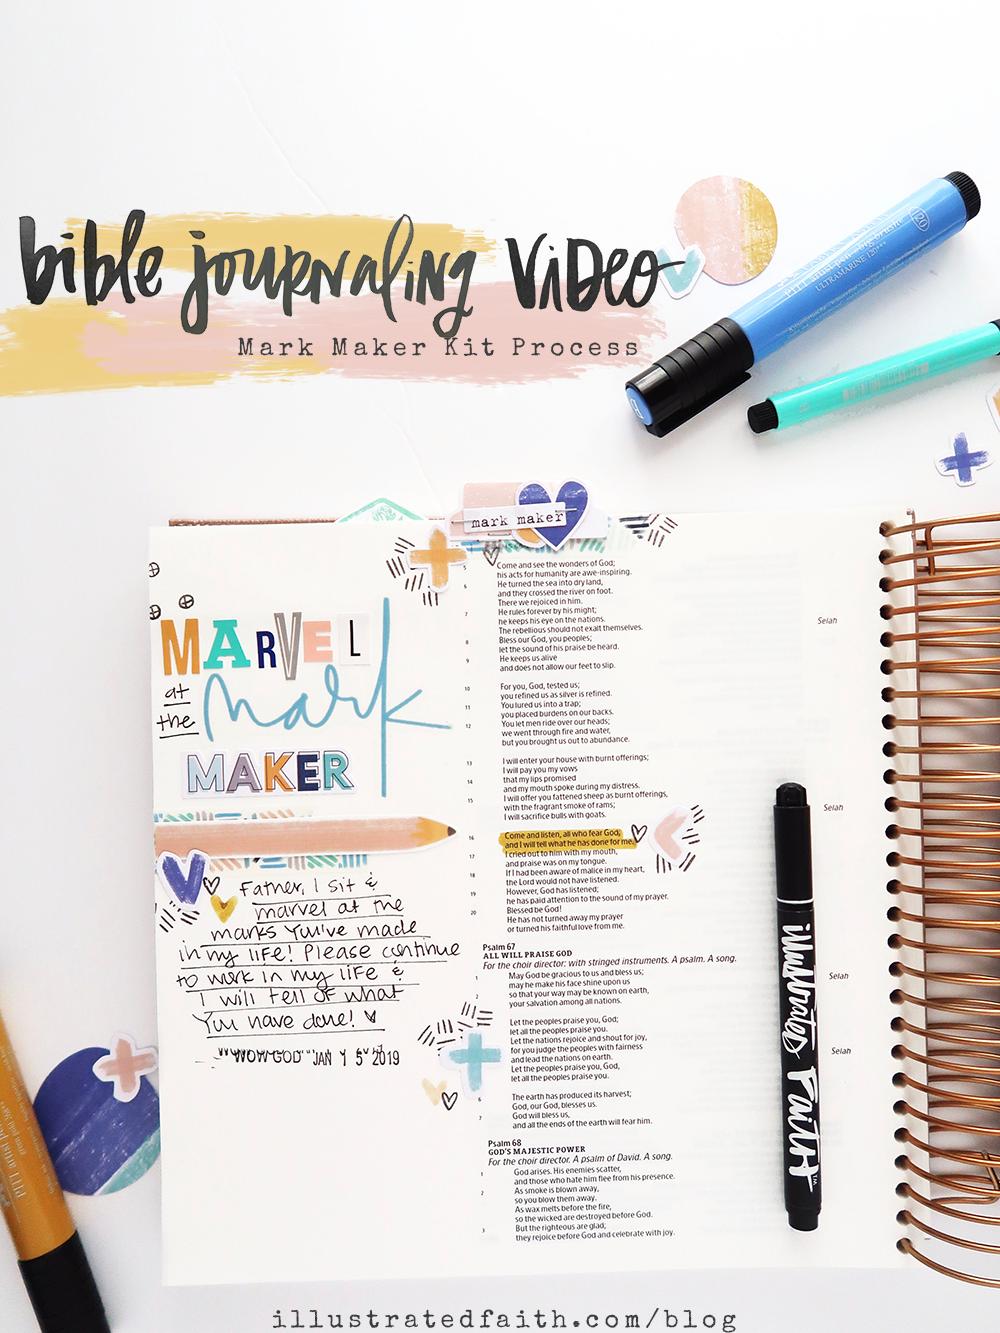 Marvel at the Mark Maker | Bible Journaling Process Video using the Illustrated Faith Mark Maker Kit by Jillian aka HelloJillsky | Psalm 66:16